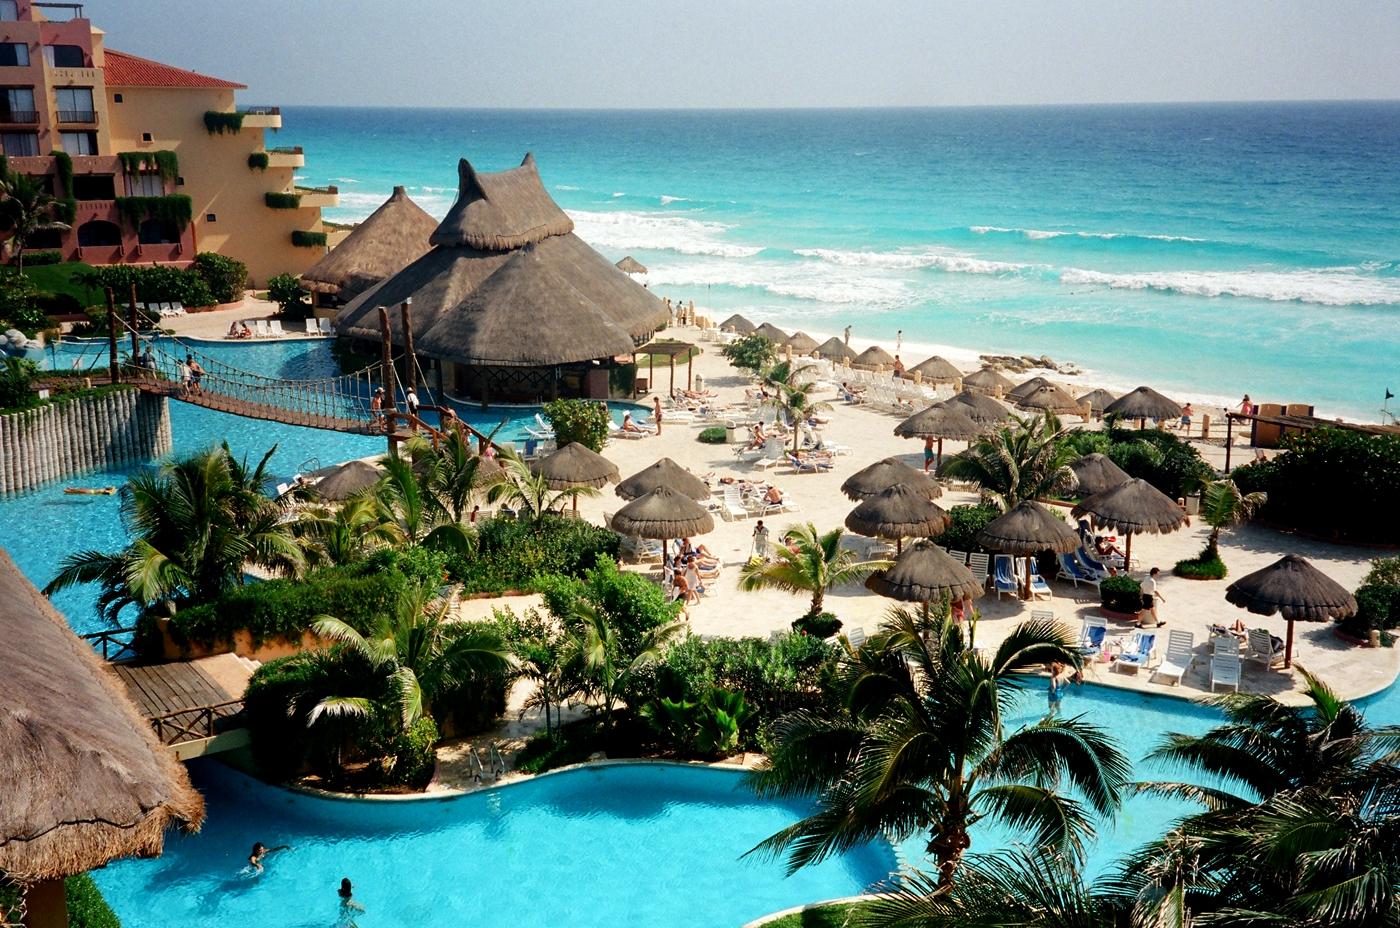 http://3.bp.blogspot.com/-dRqZWC3yhhI/T2Vli2EmfNI/AAAAAAAABlY/V6QrwgDF_0M/s1600/Cancun,%20Mexico.jpg